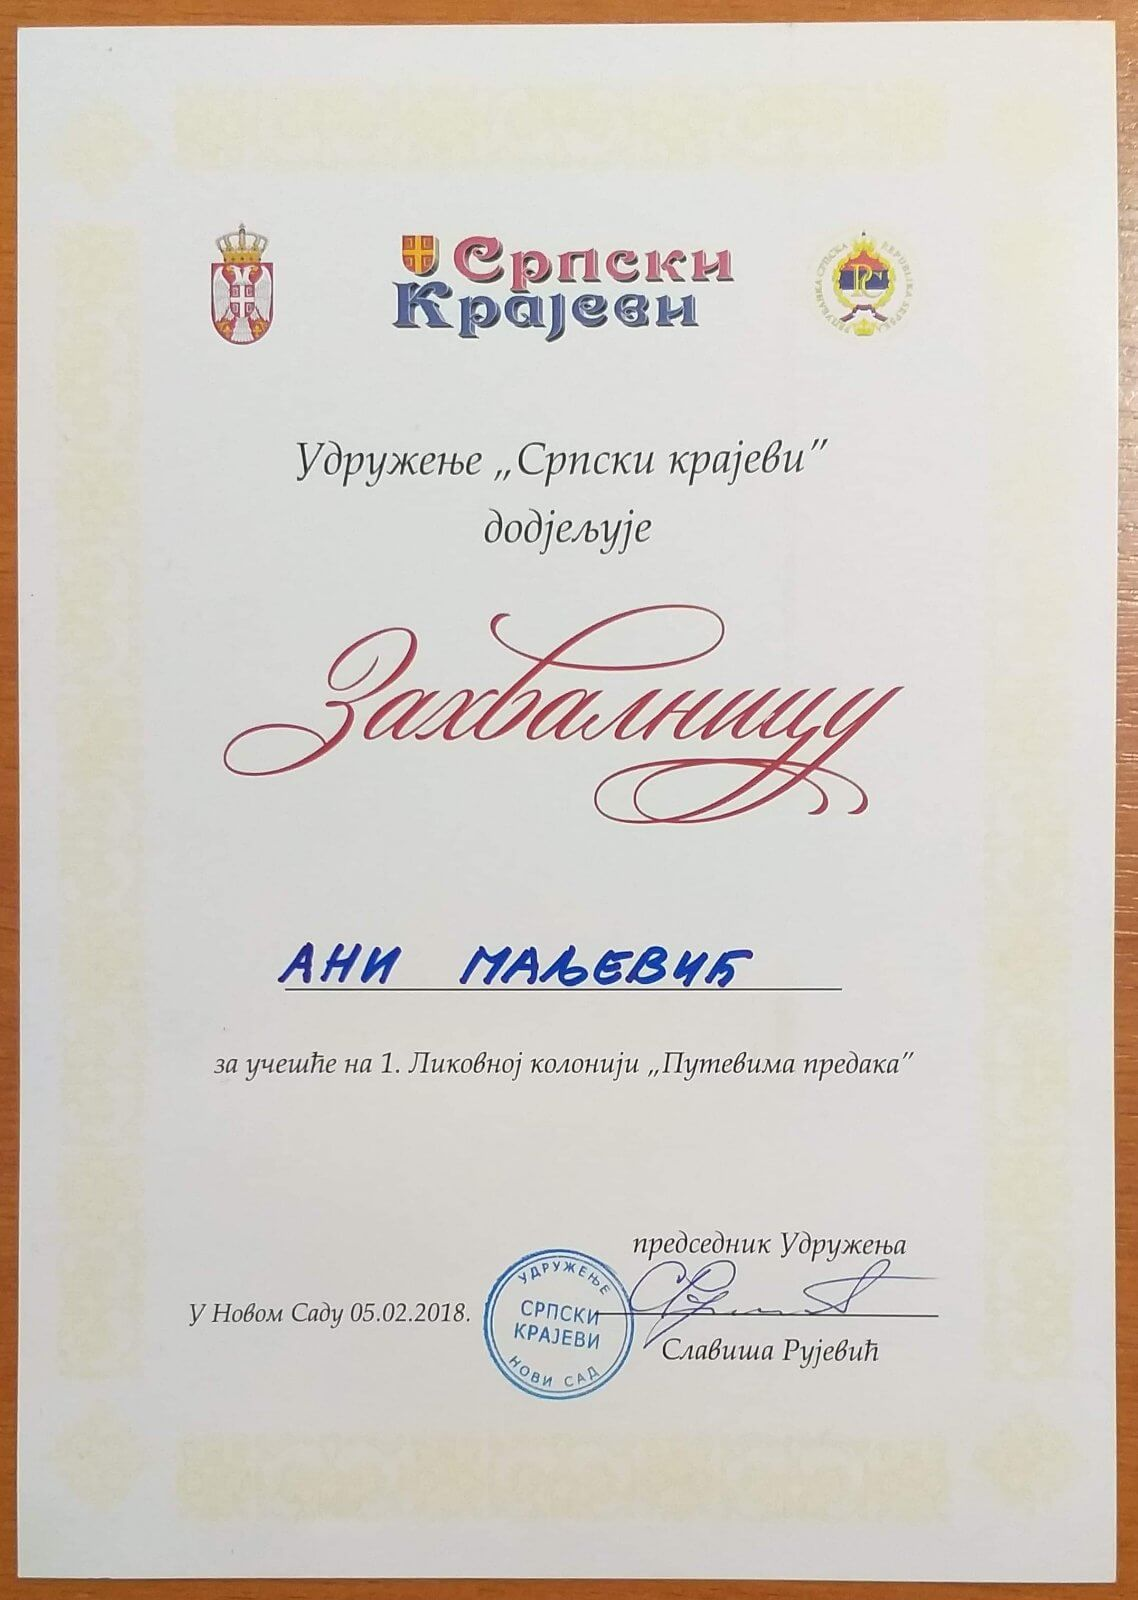 Ana Maljevic - Pravslavne ikone po narudžbini - Katalog izložbi 11